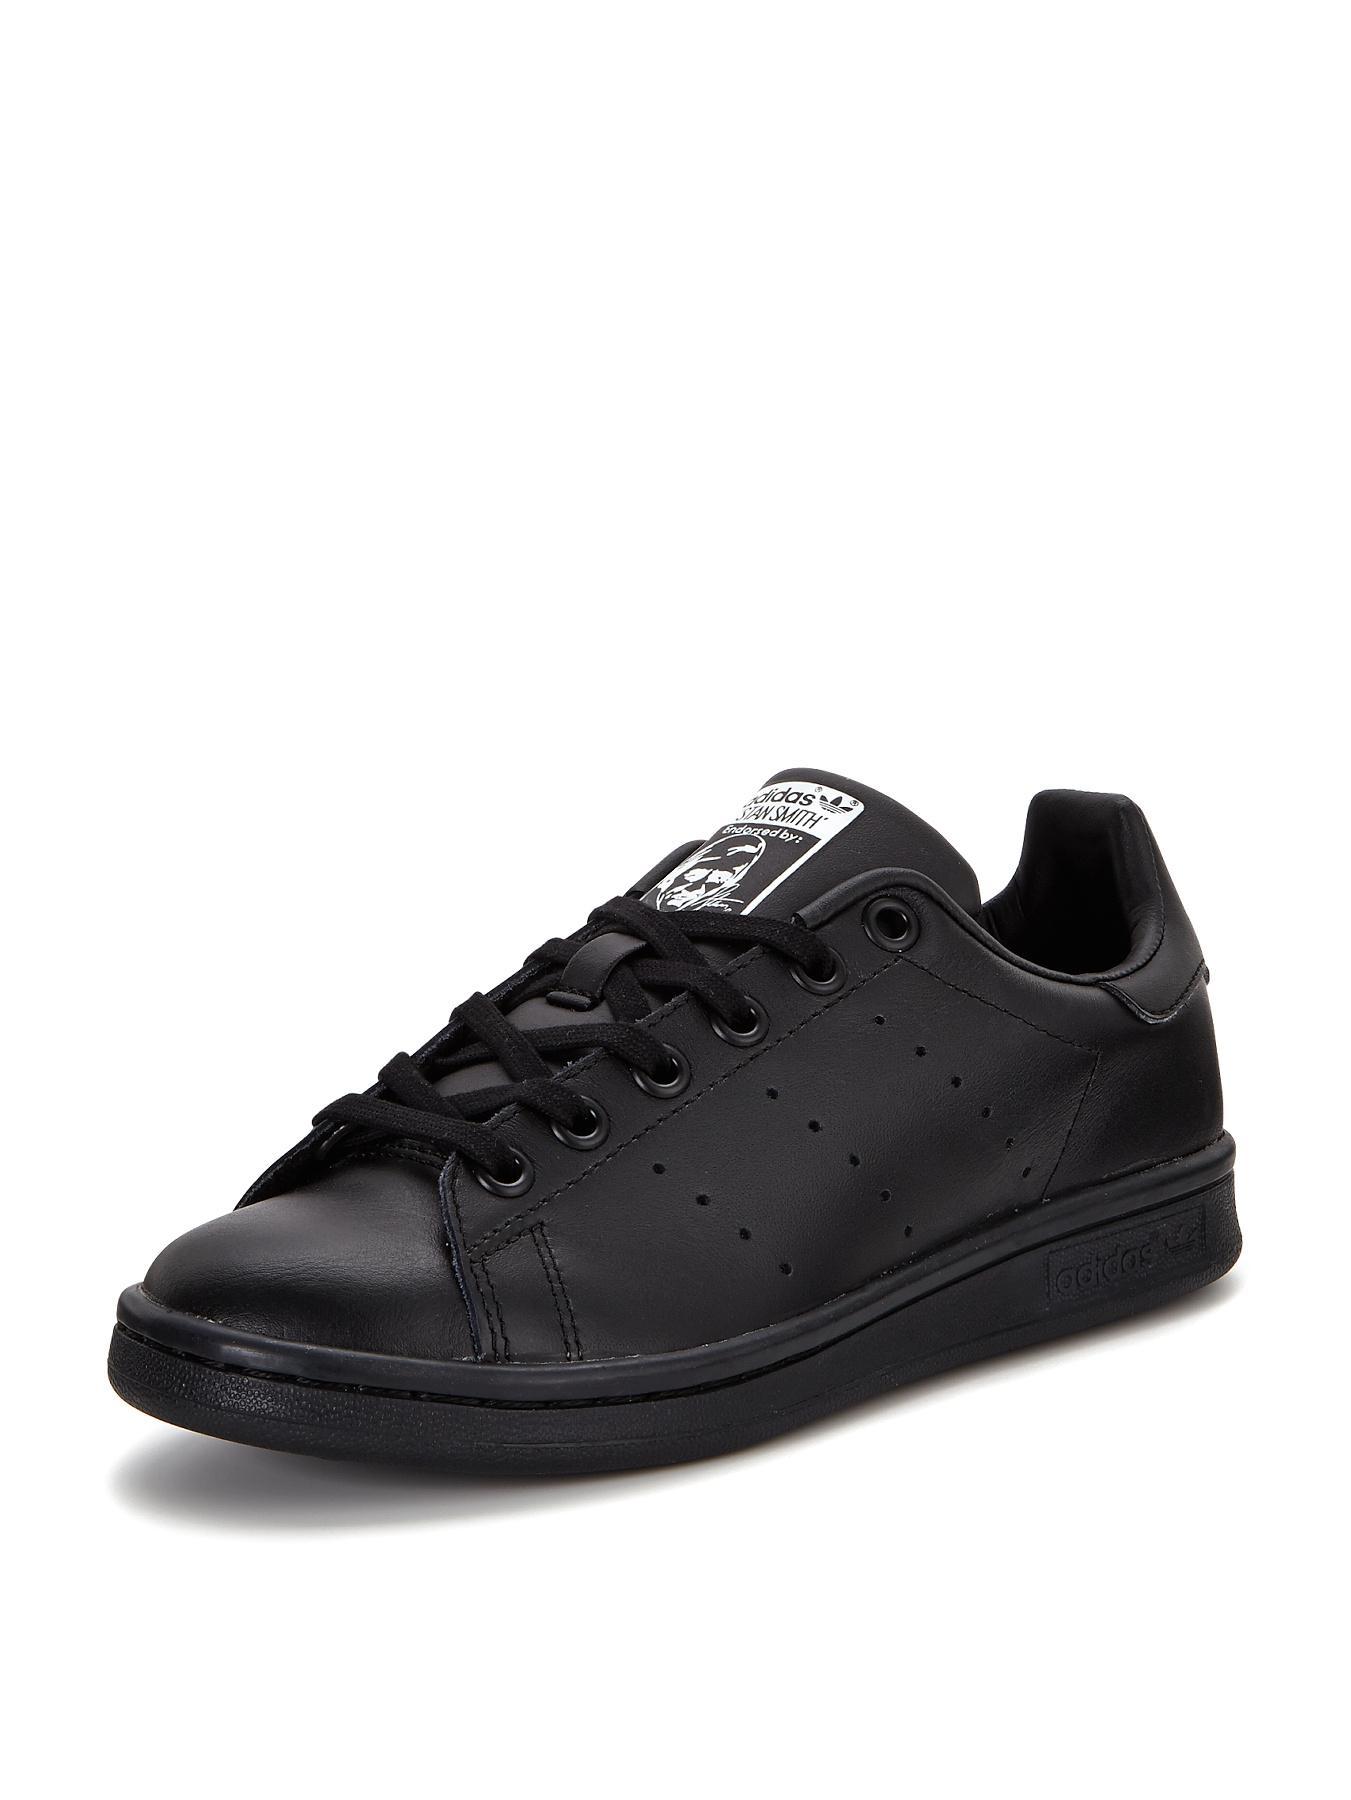 adidas Originals Stan Smith Junior Trainers - Black, Black